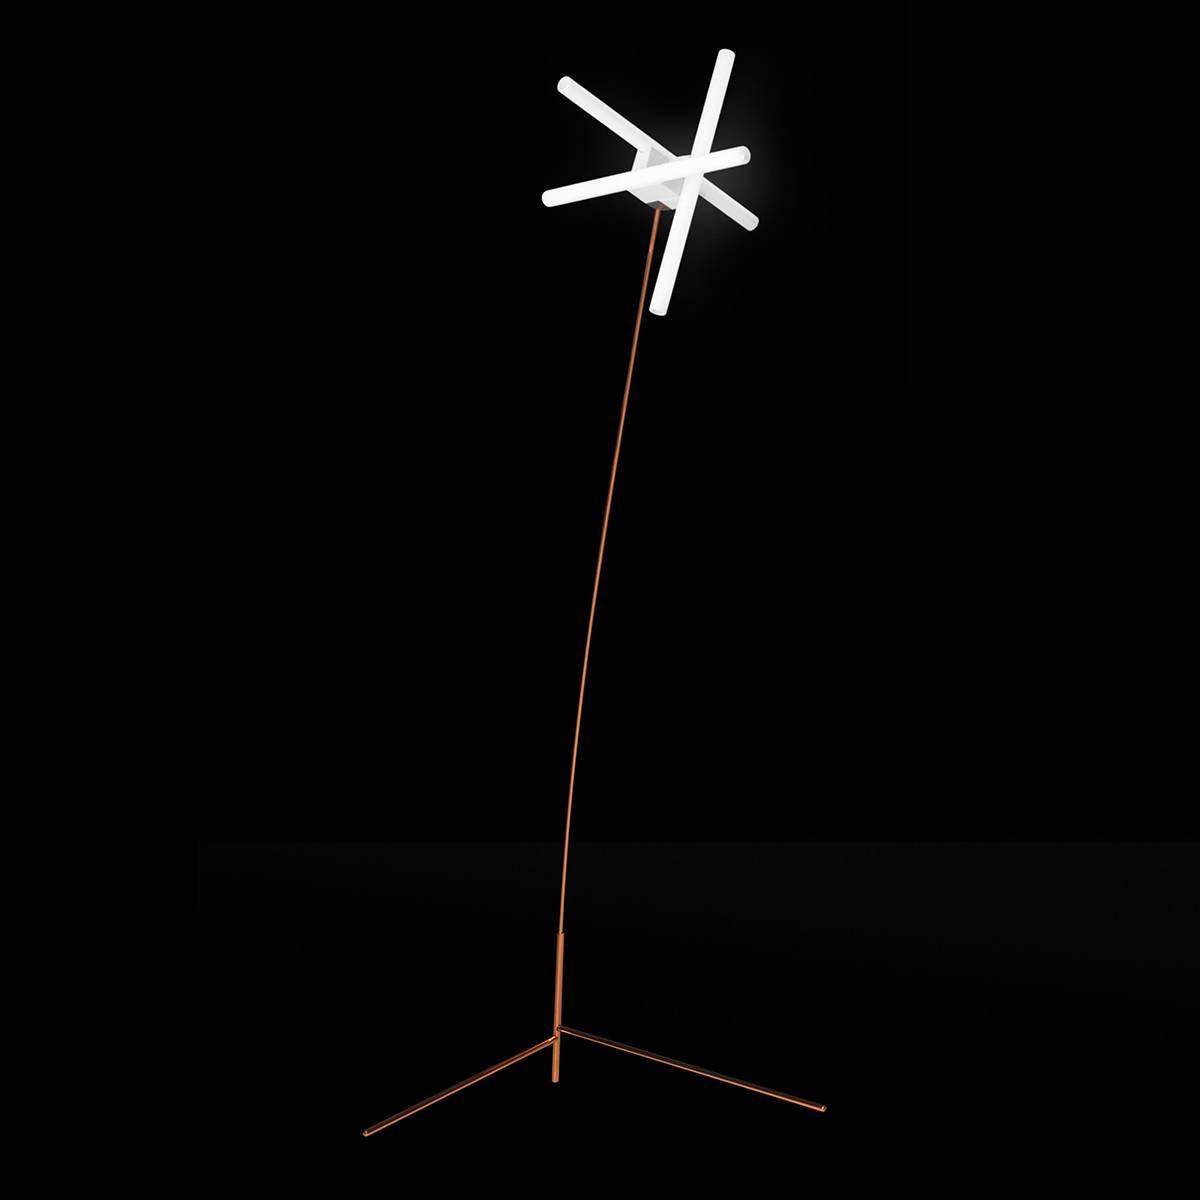 b.d barcelona design  Olvidada Lamp-Standing Lamp 落地灯